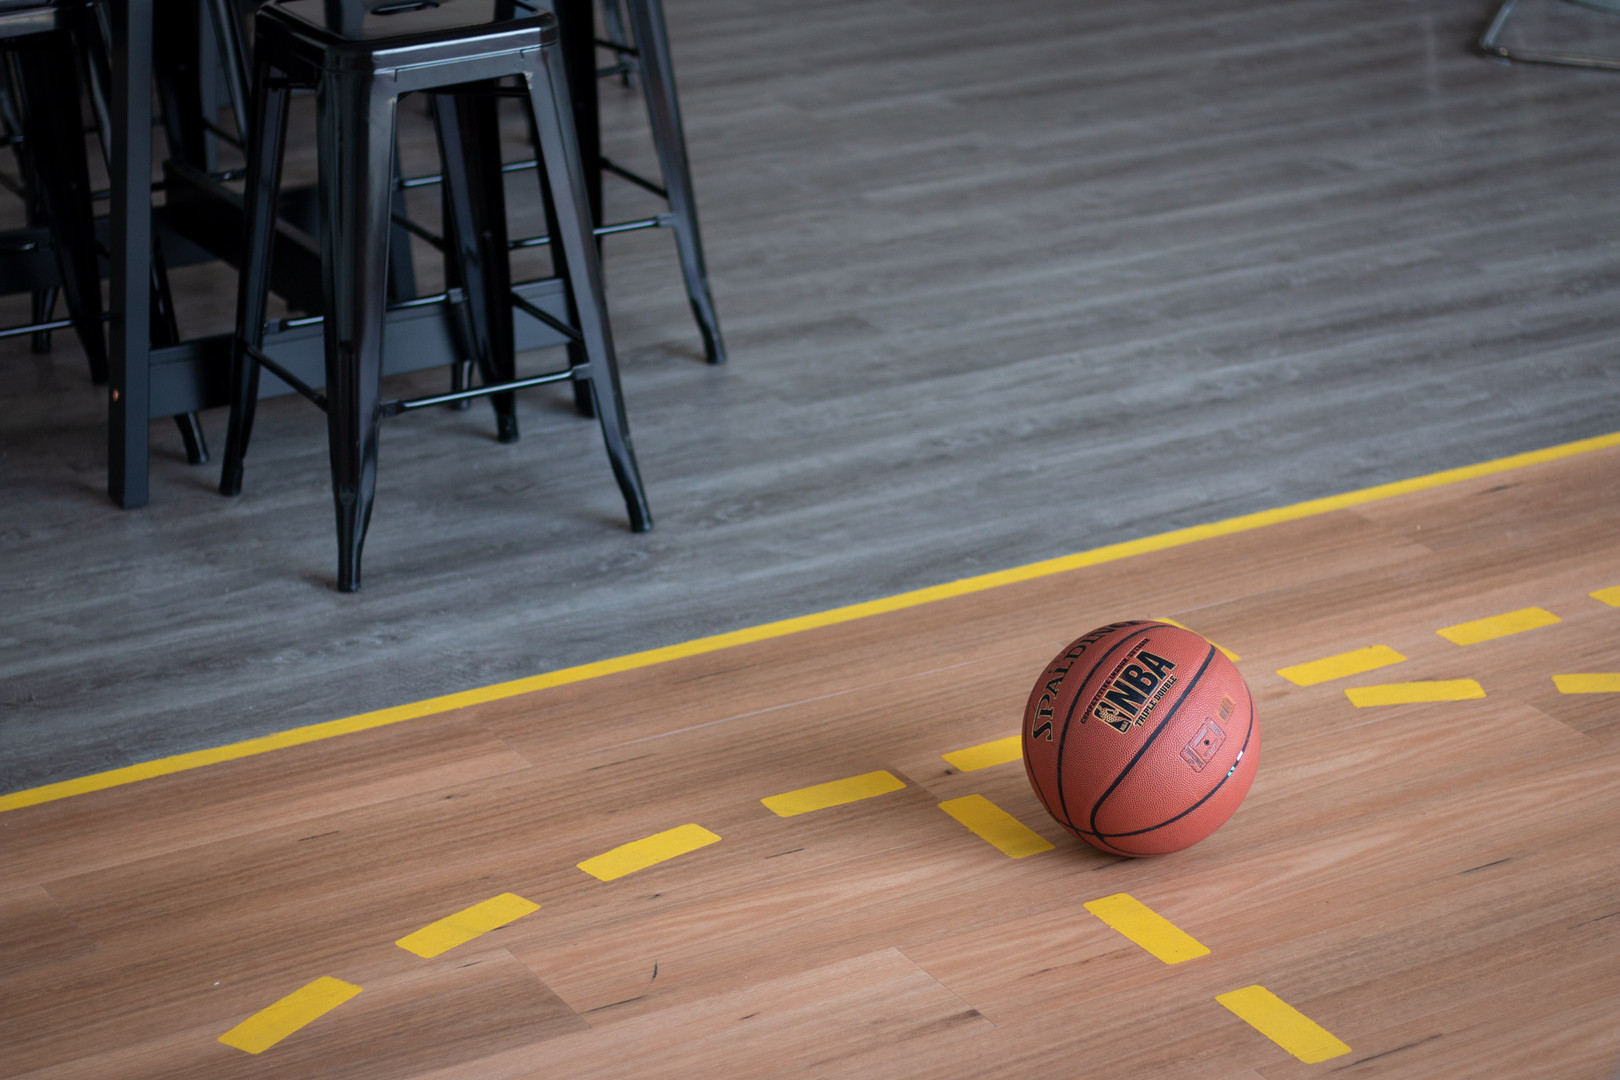 Basketball-on-court-2.jpg